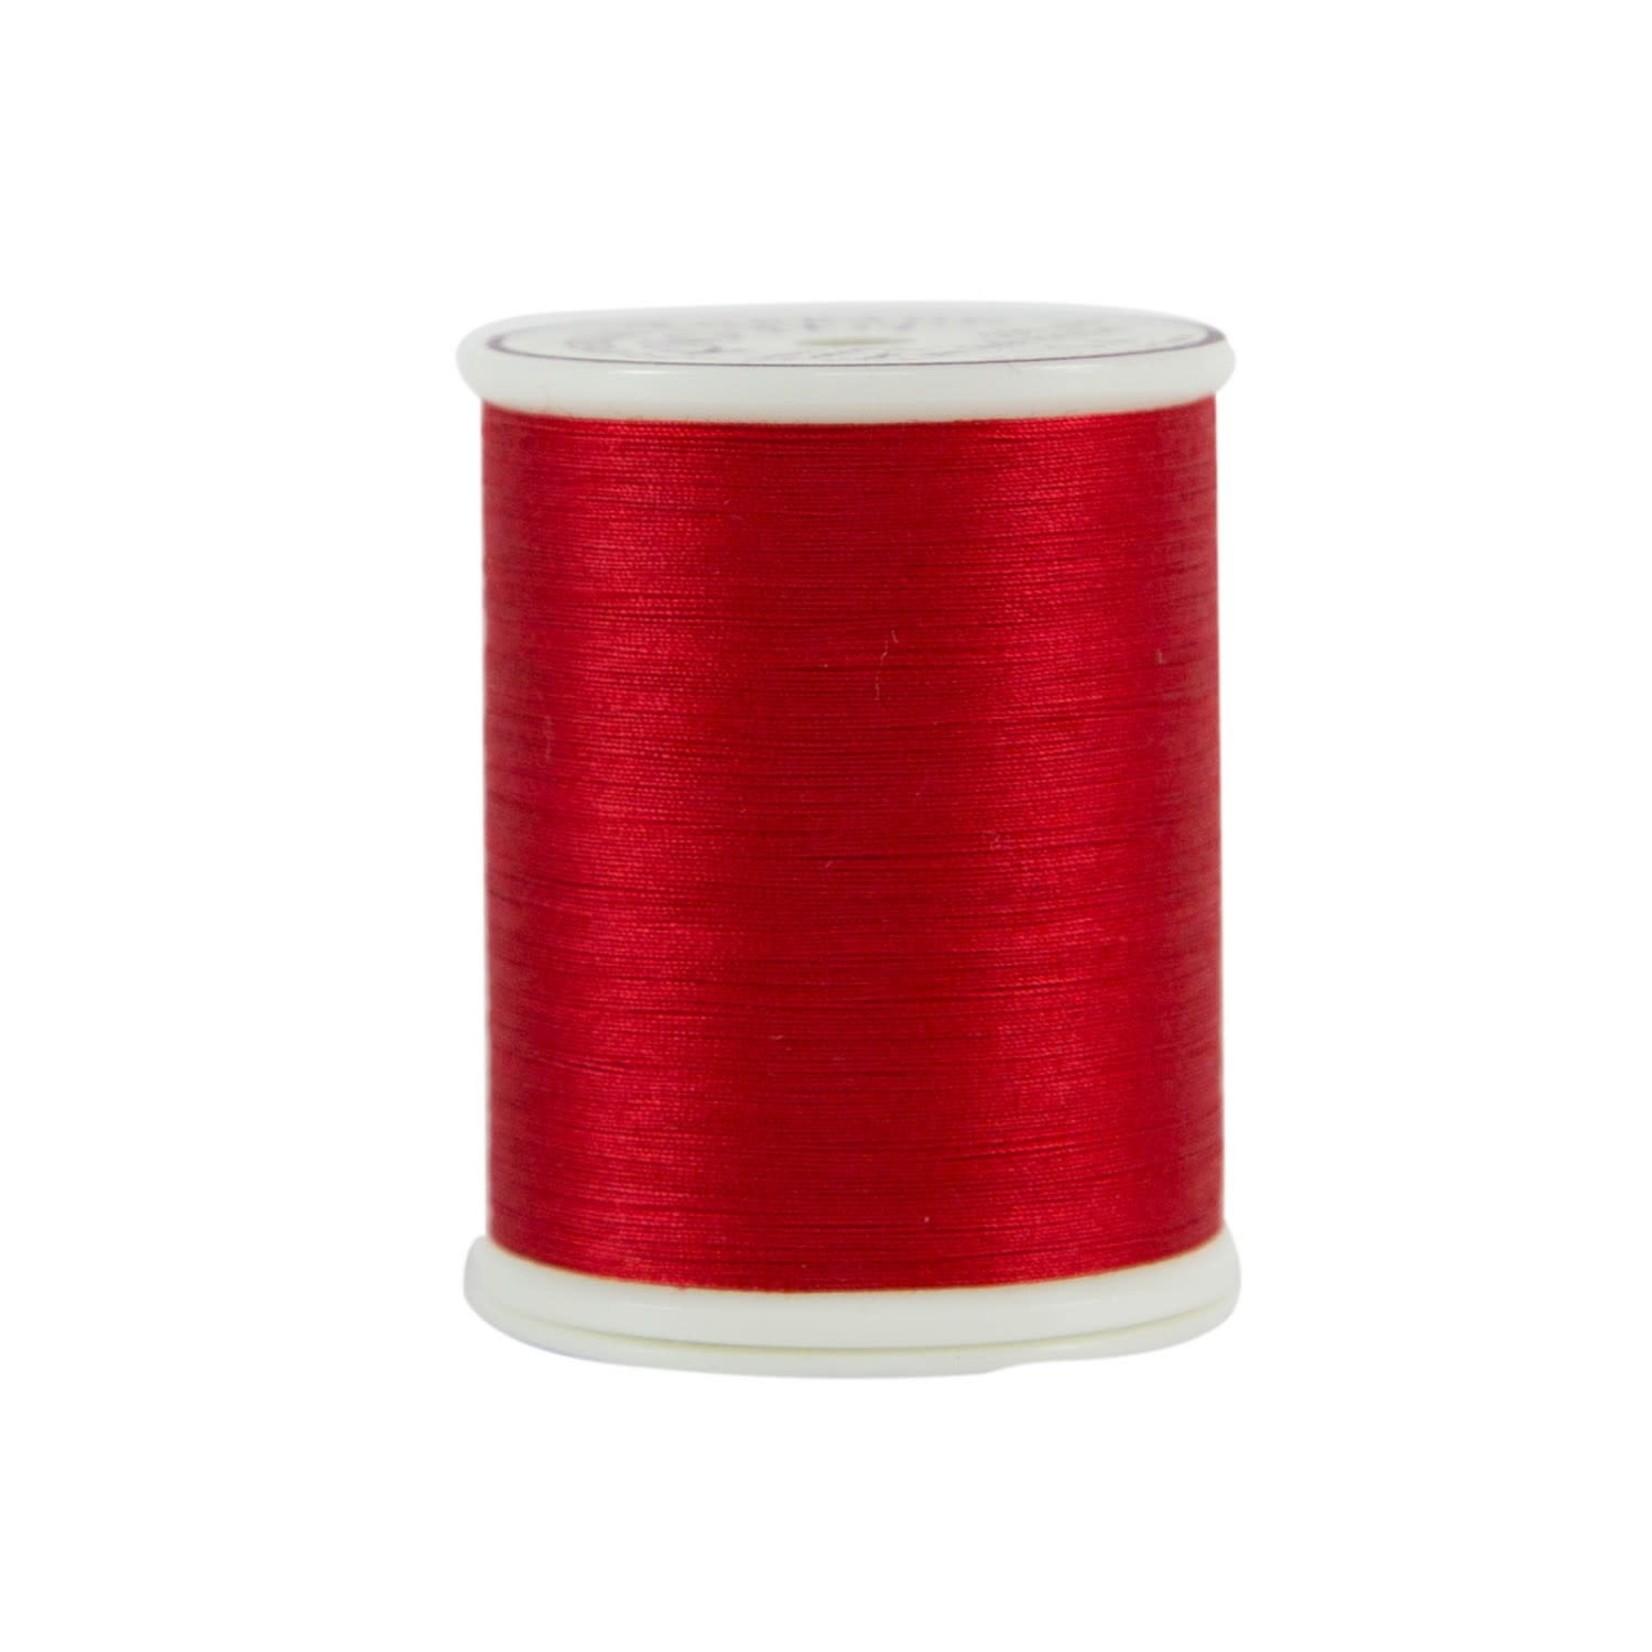 Superior Threads King Tut - #40 - 457 m - 1004 Cheery Red